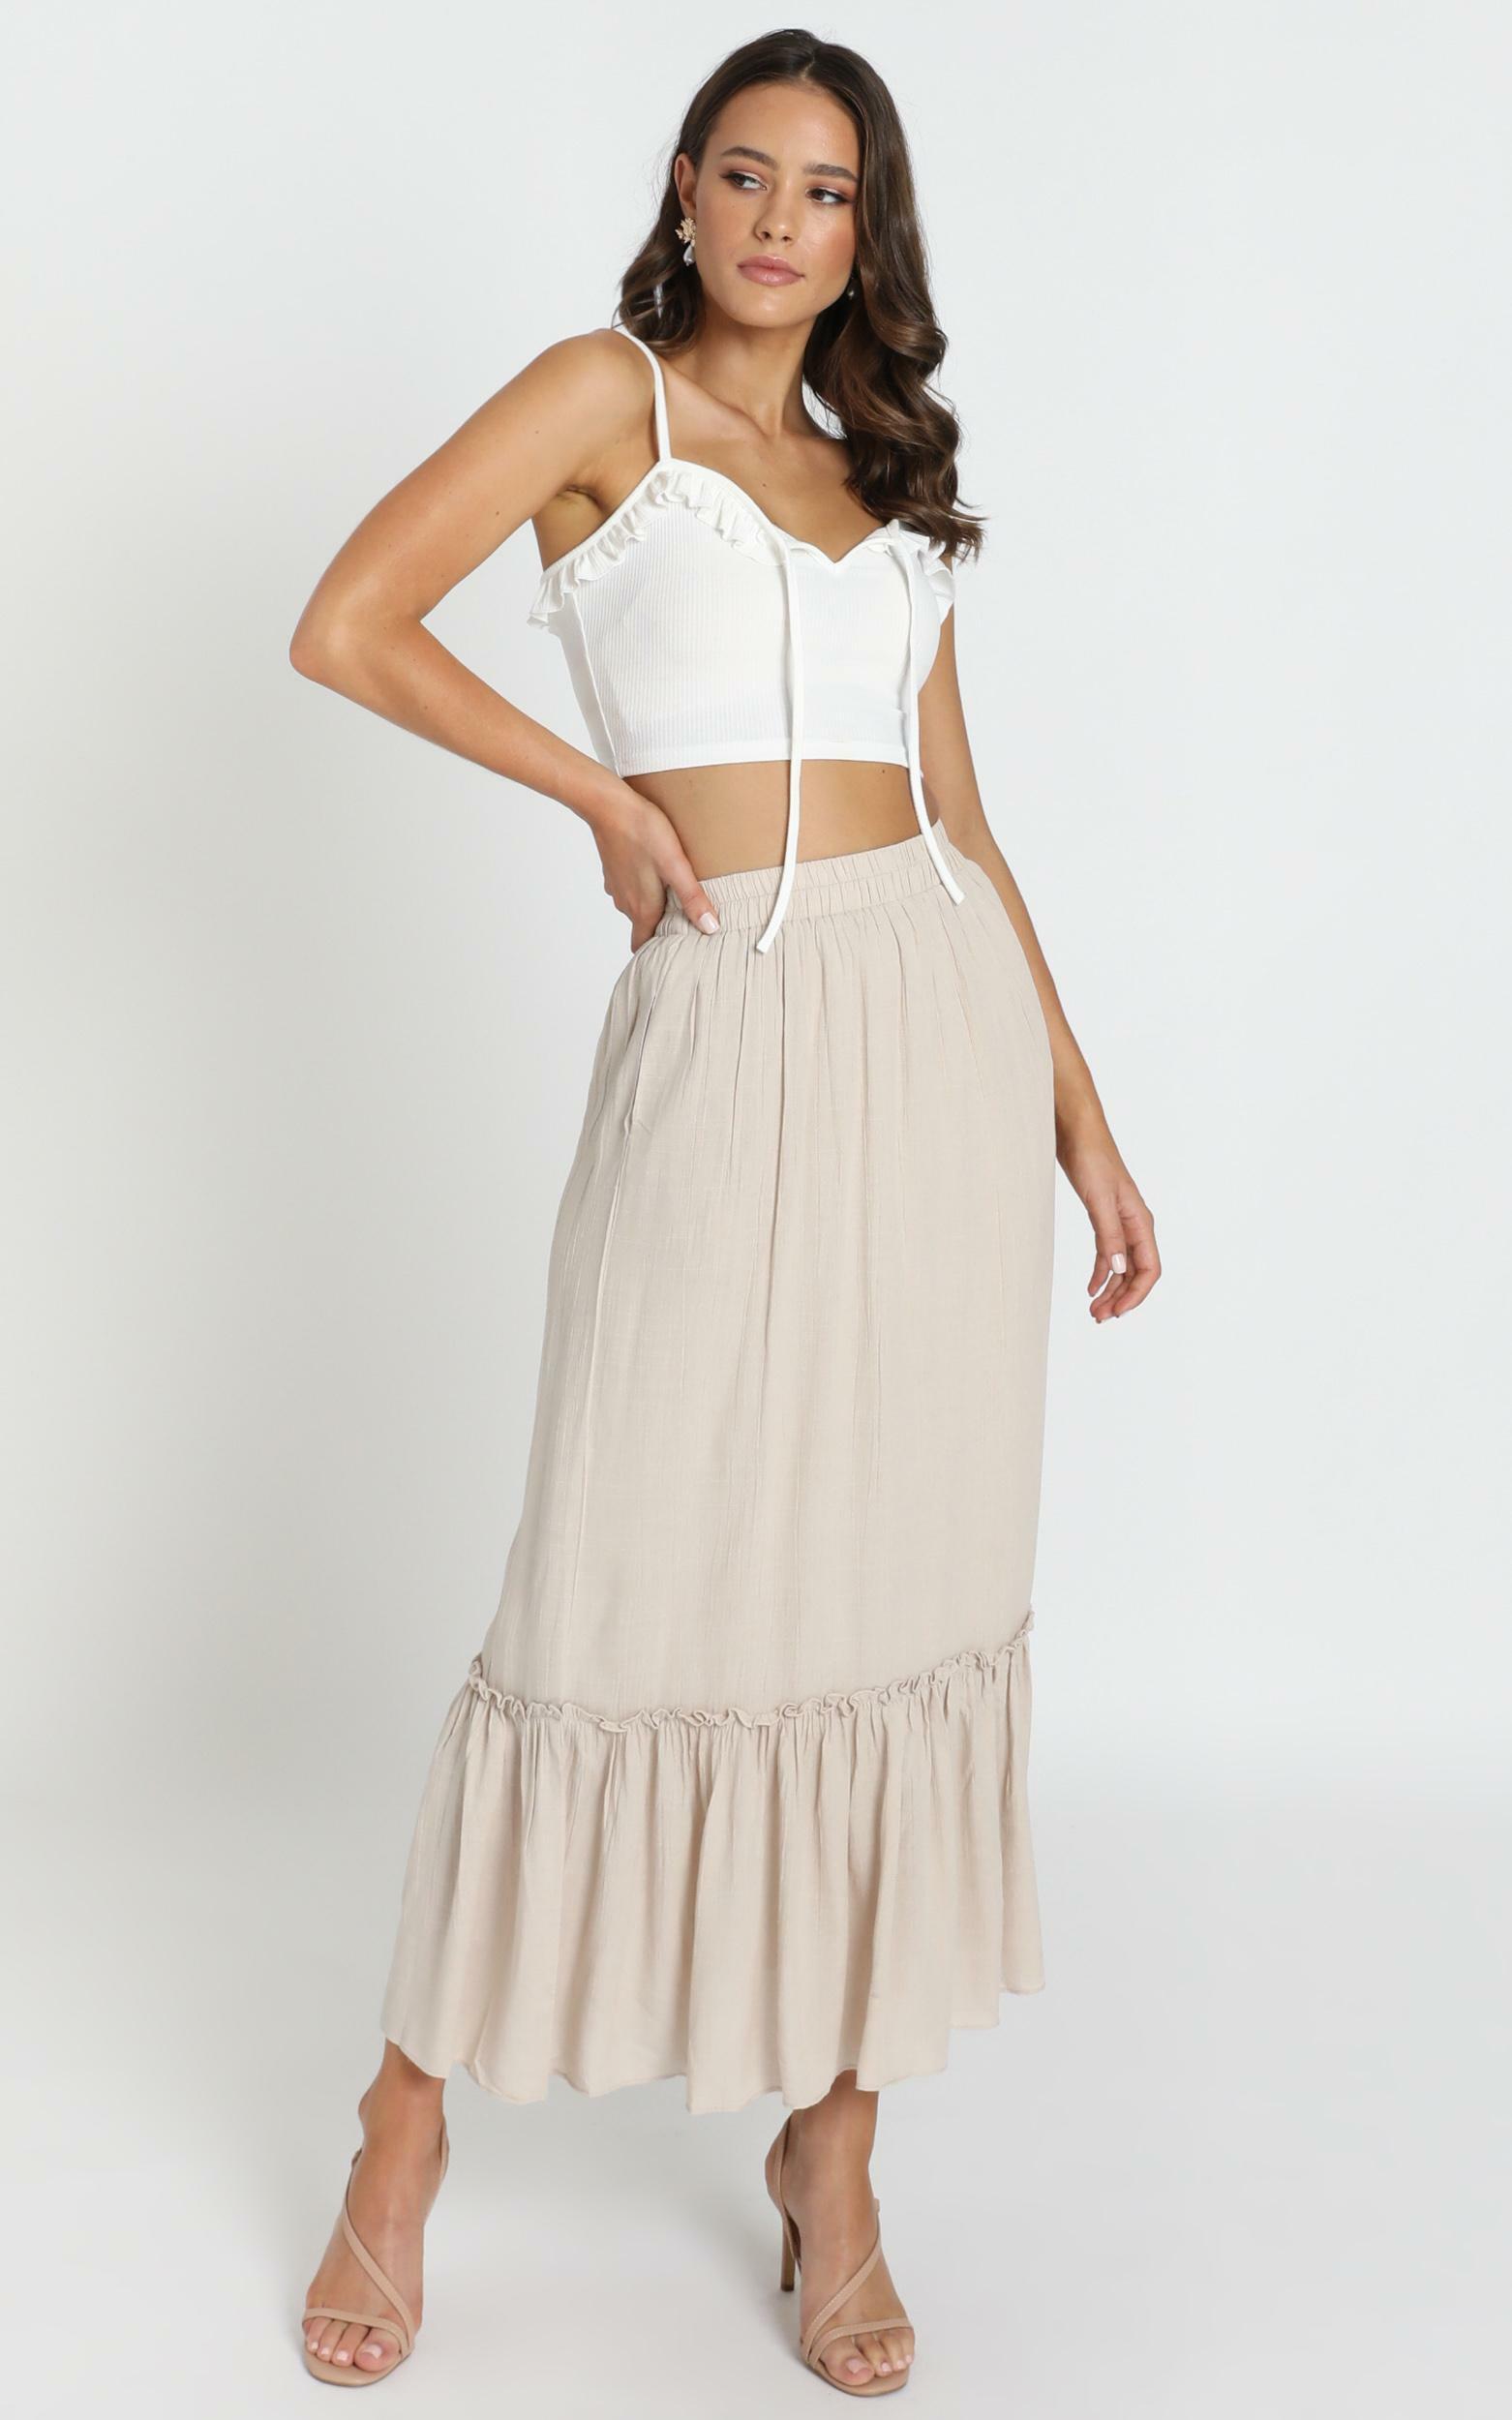 Fatima Boho Skirt in beige - 6 (XS), Beige, hi-res image number null